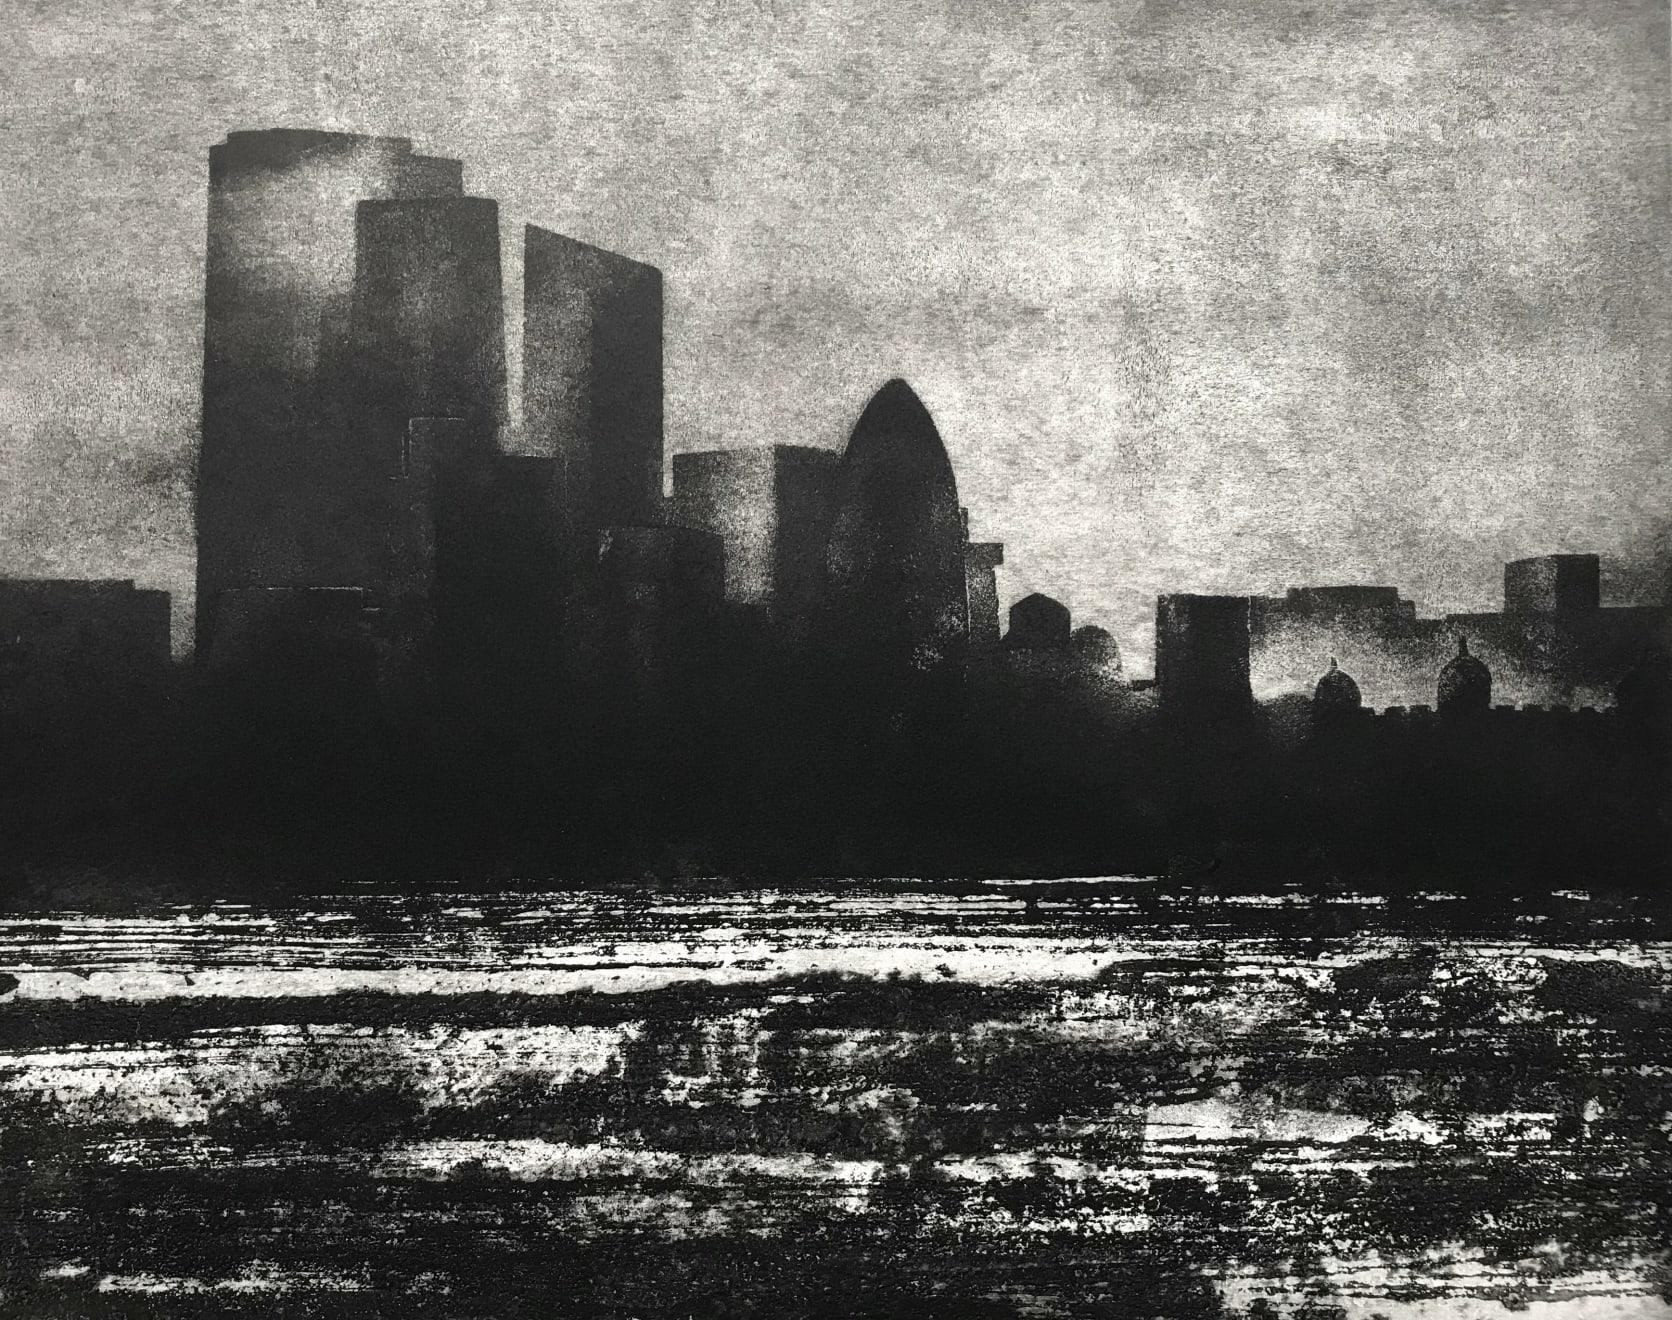 Jason Hicklin, The Thames. City of London, 2019